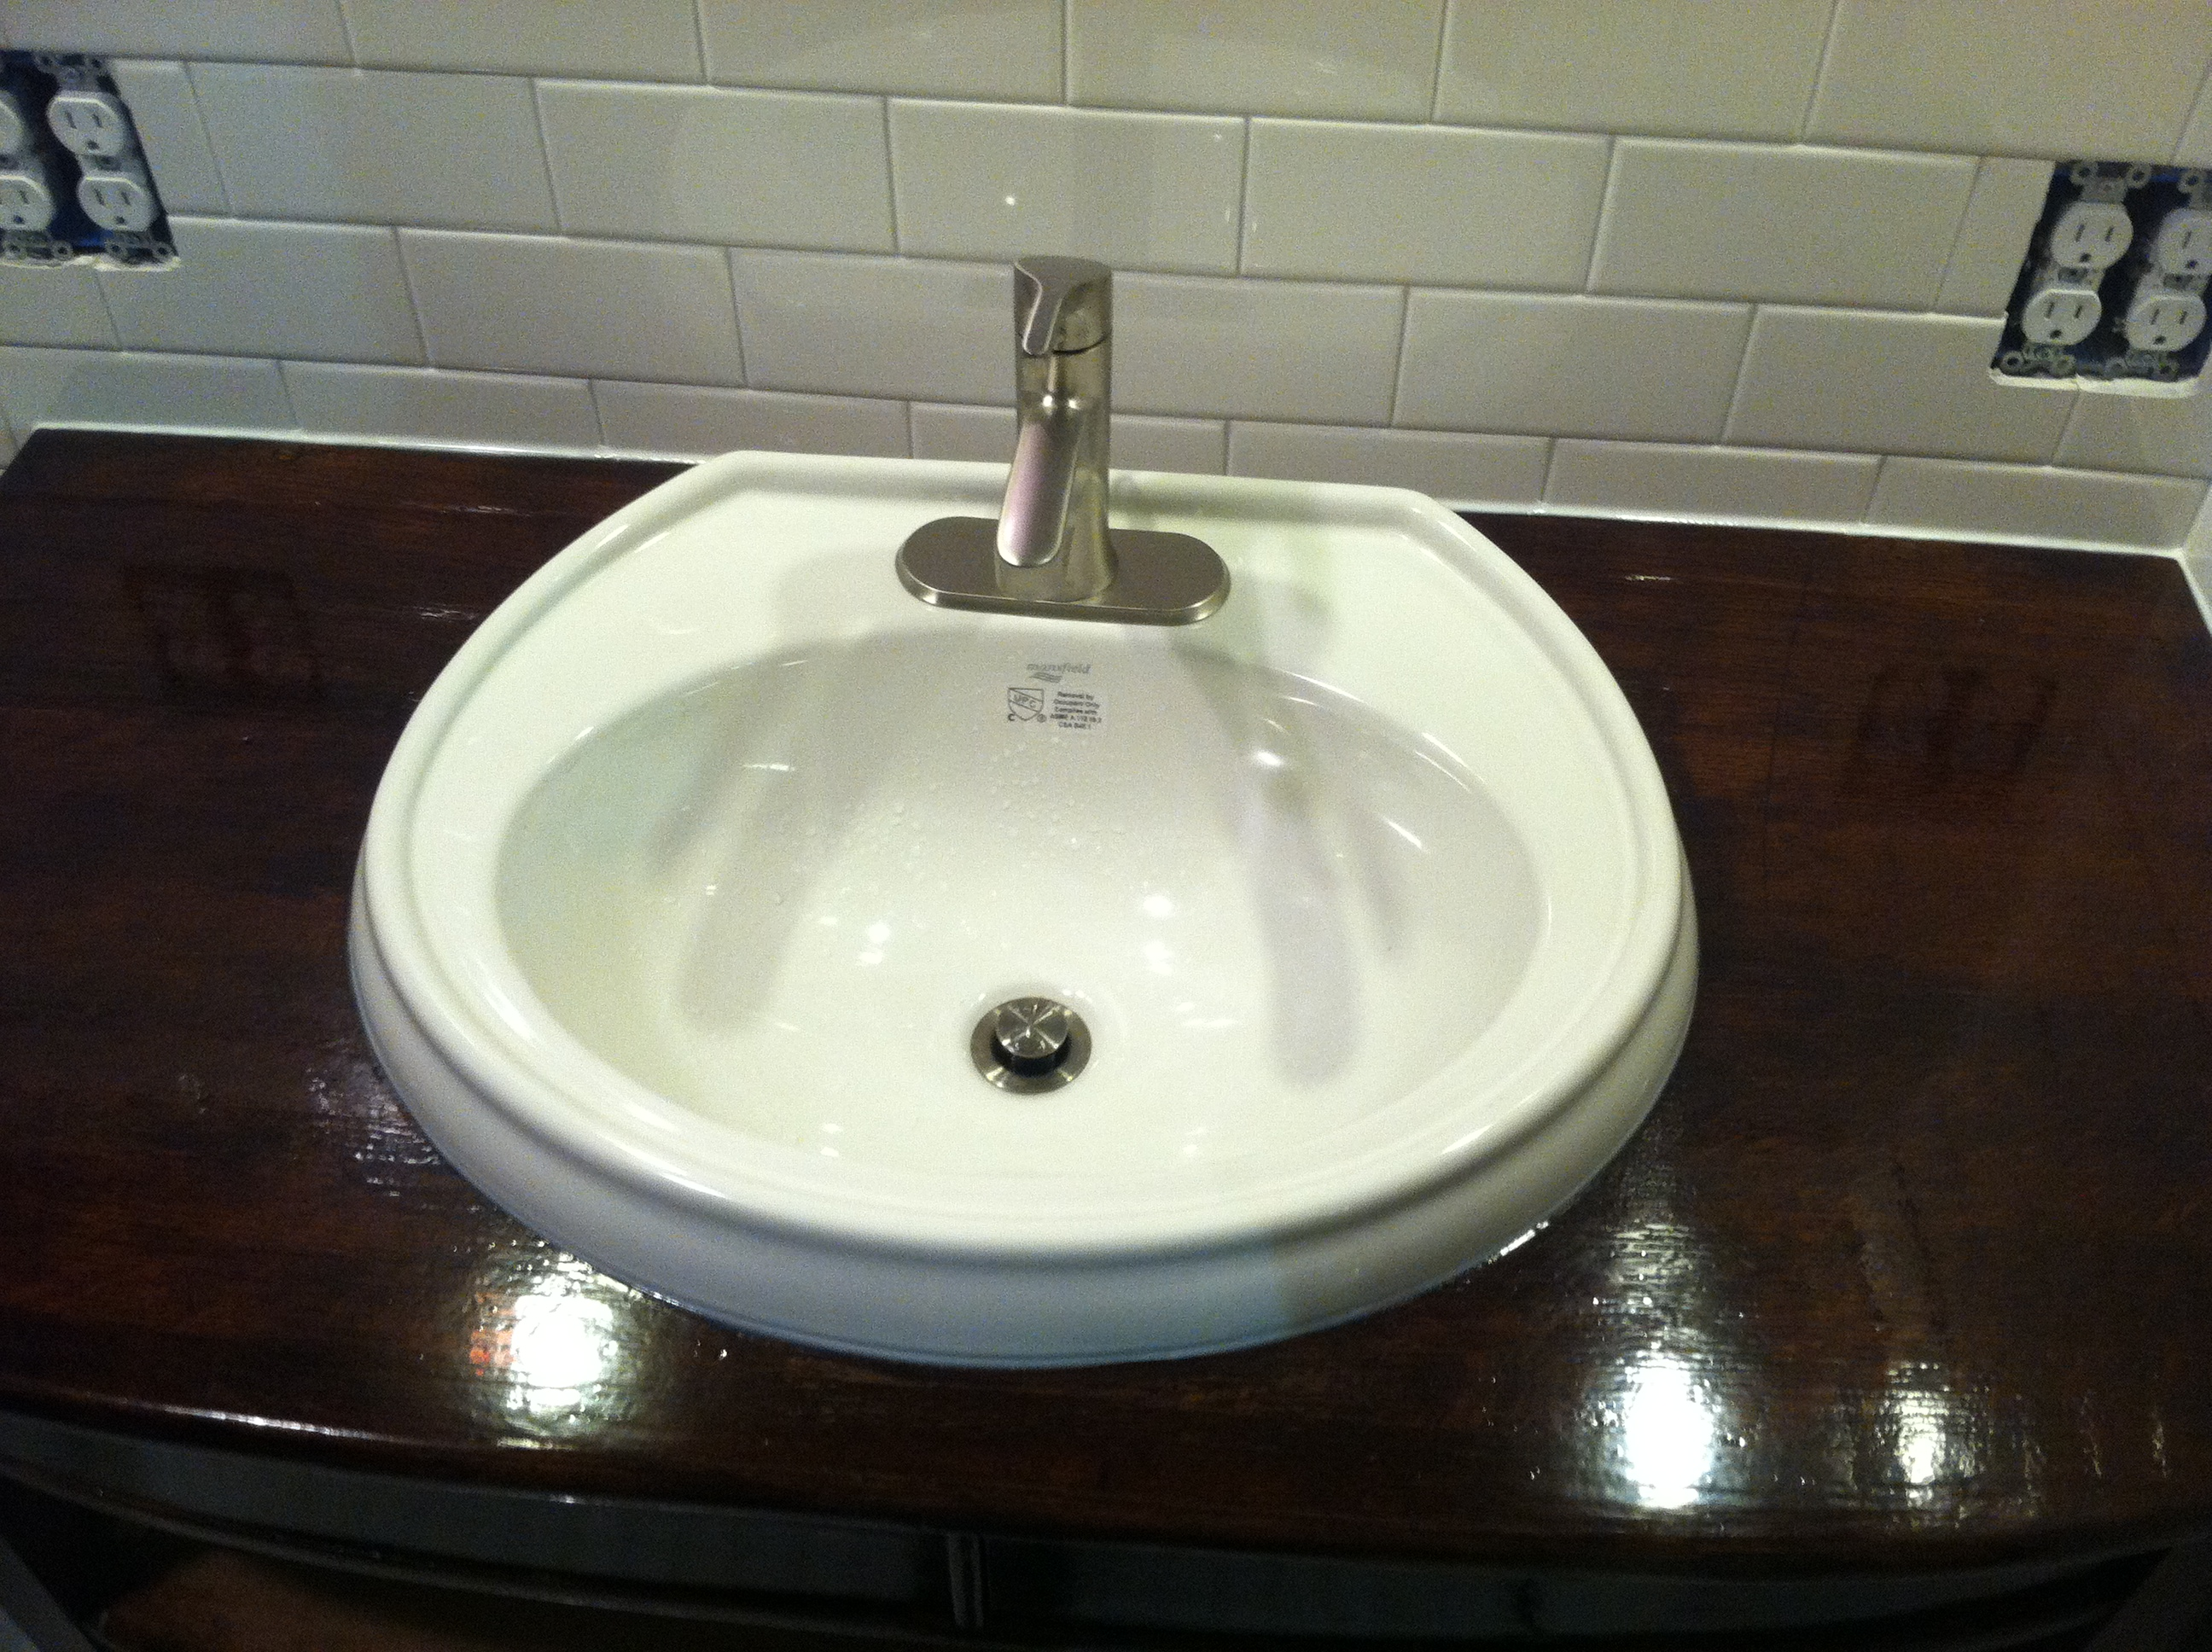 Sink Up And Adam Ries - Bathroom sink sealant